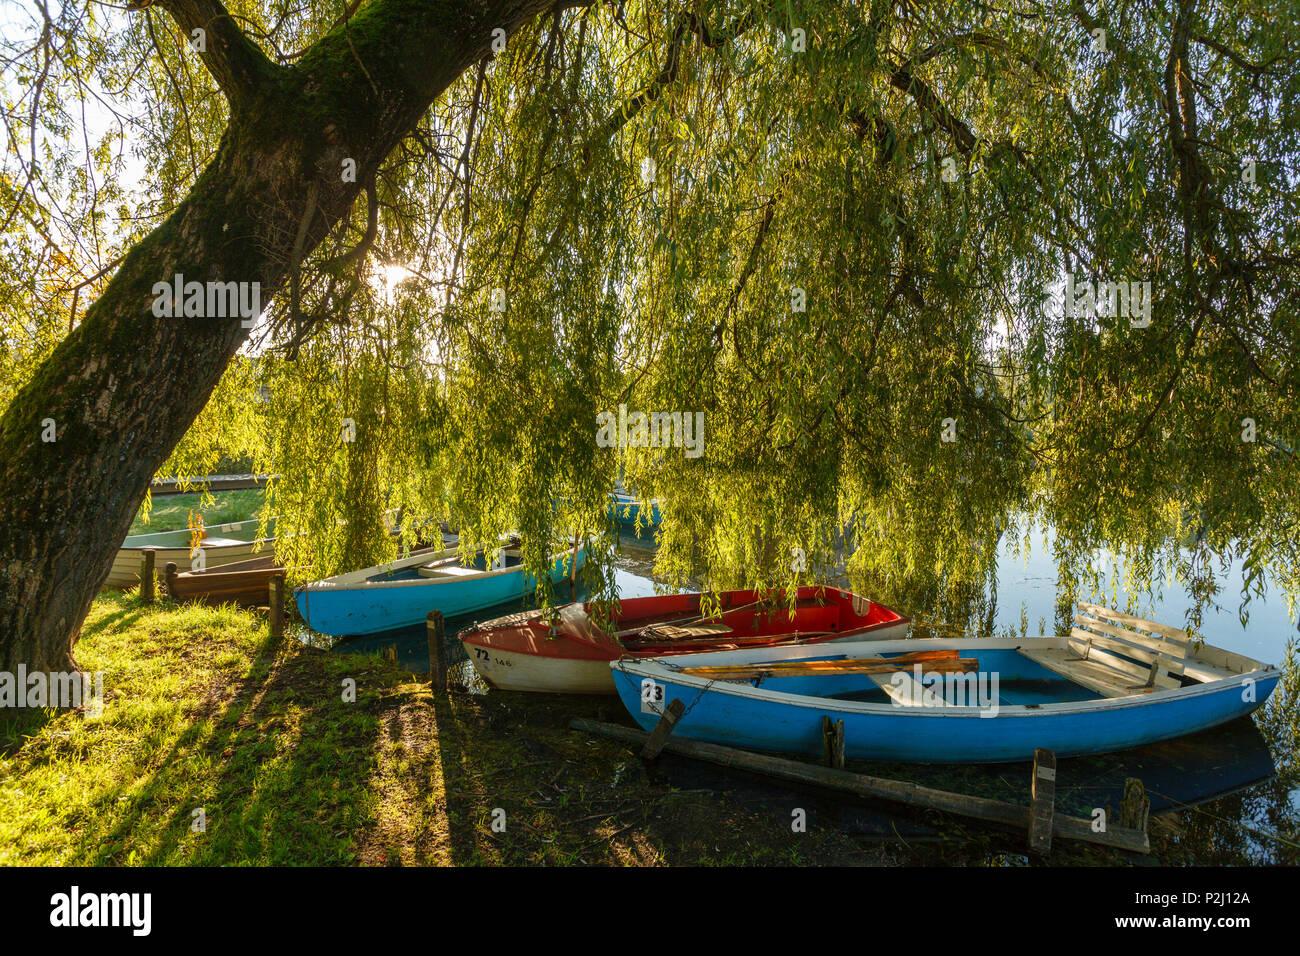 rowing boats on the banks beneath a willow tree, Seehausen am Staffelsee, near Murnau, Blue Land, district Garmisch-Partenkirche - Stock Image